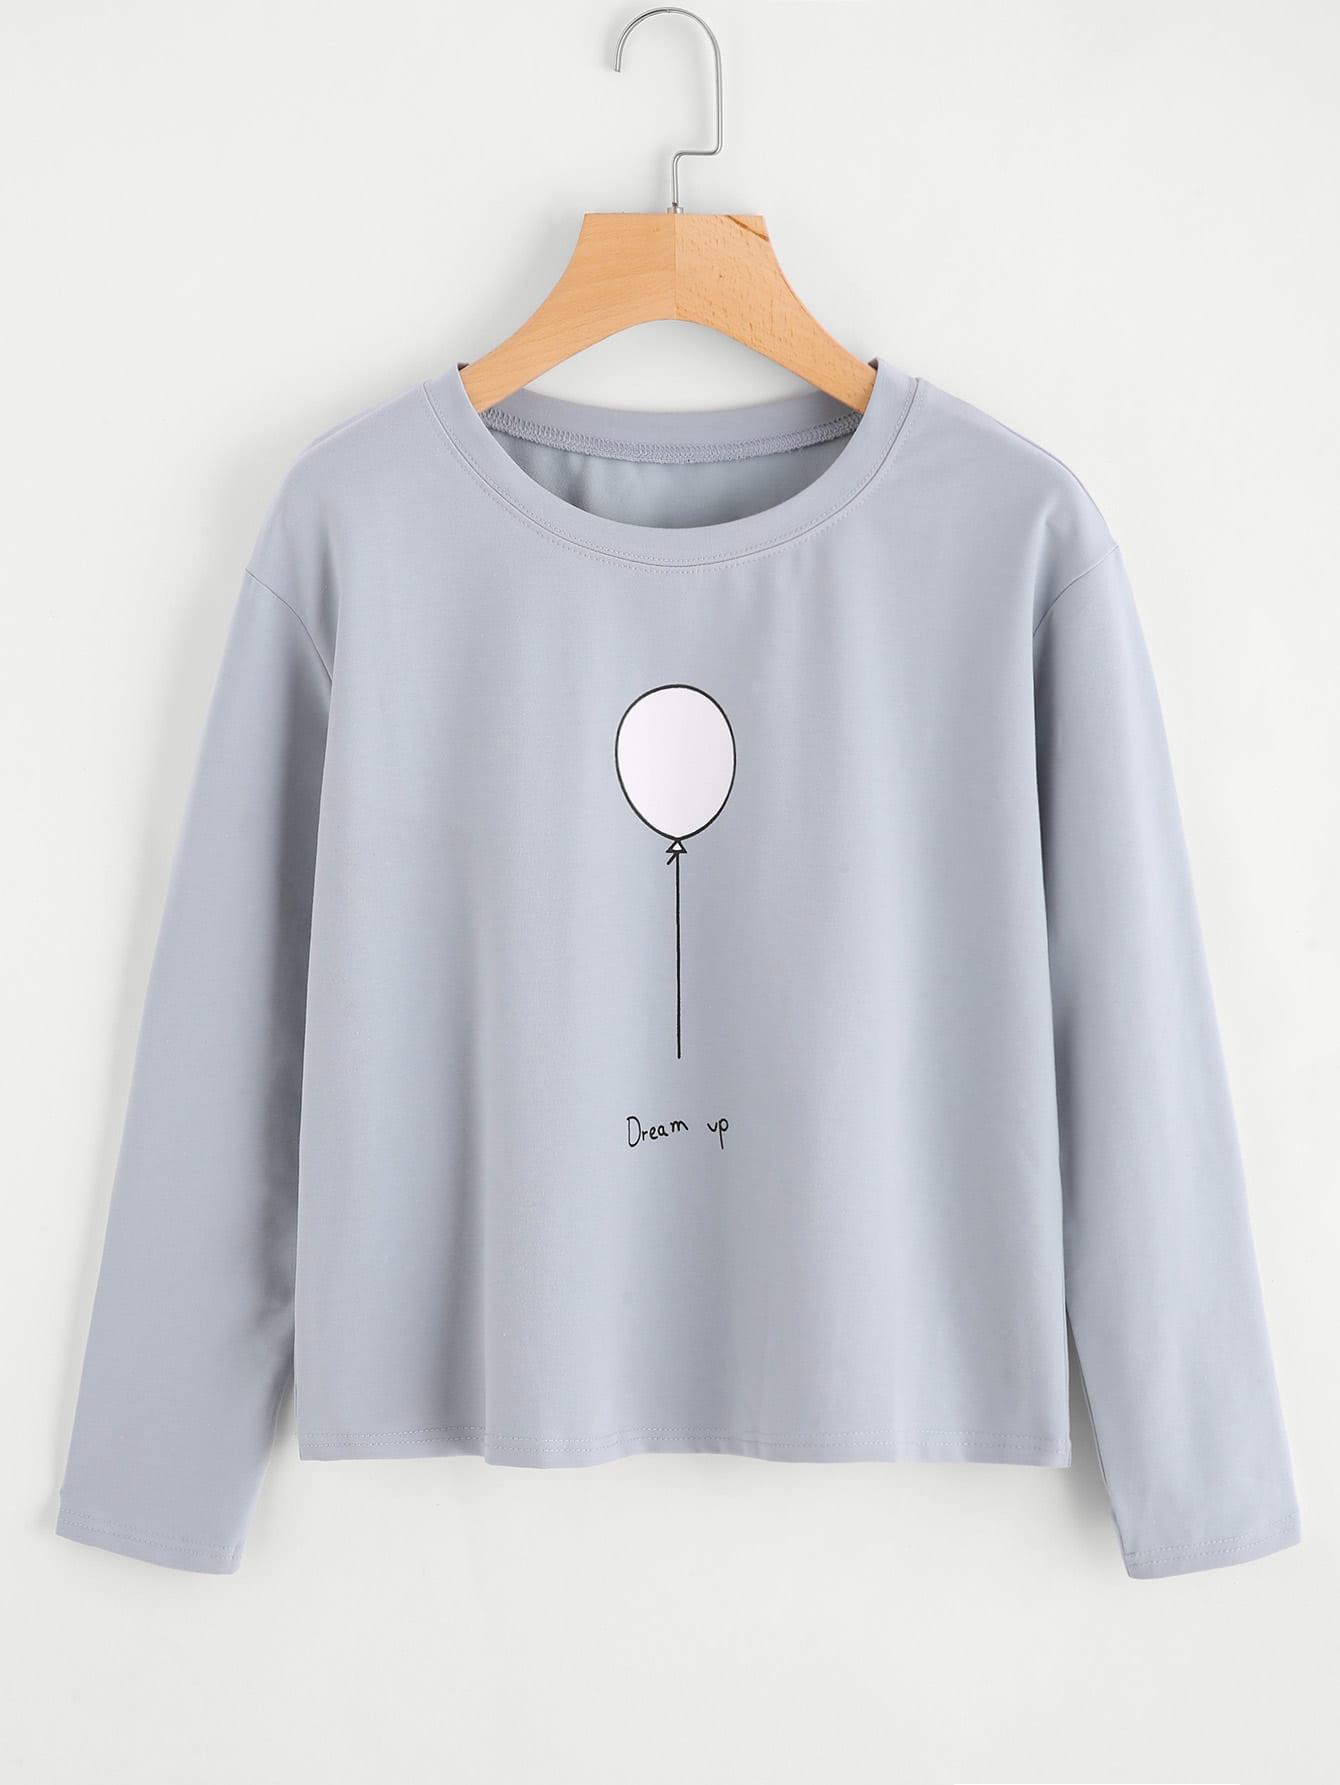 Balloon Print T-shirt rtsh170921020